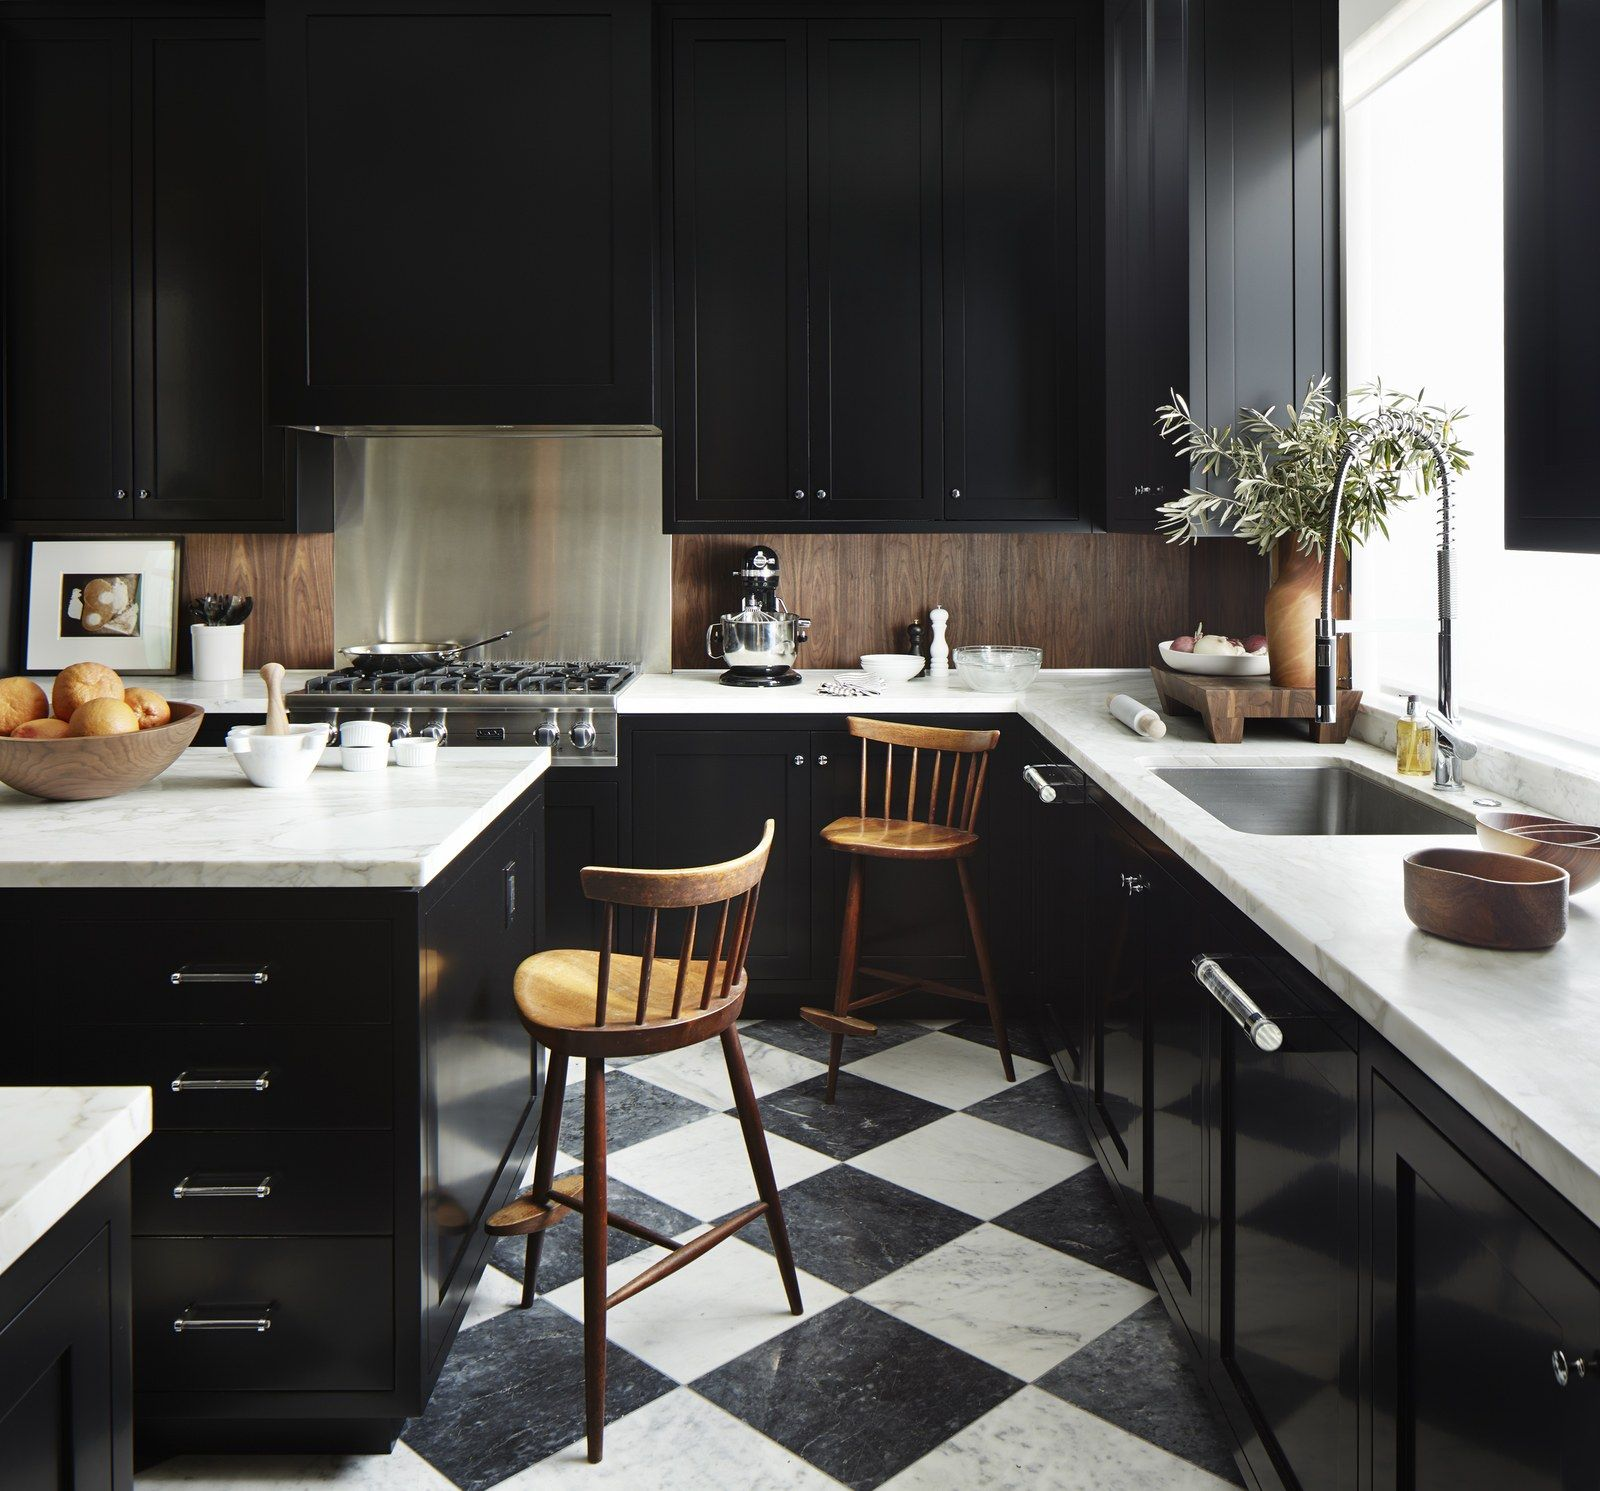 Keuken in hoogglans